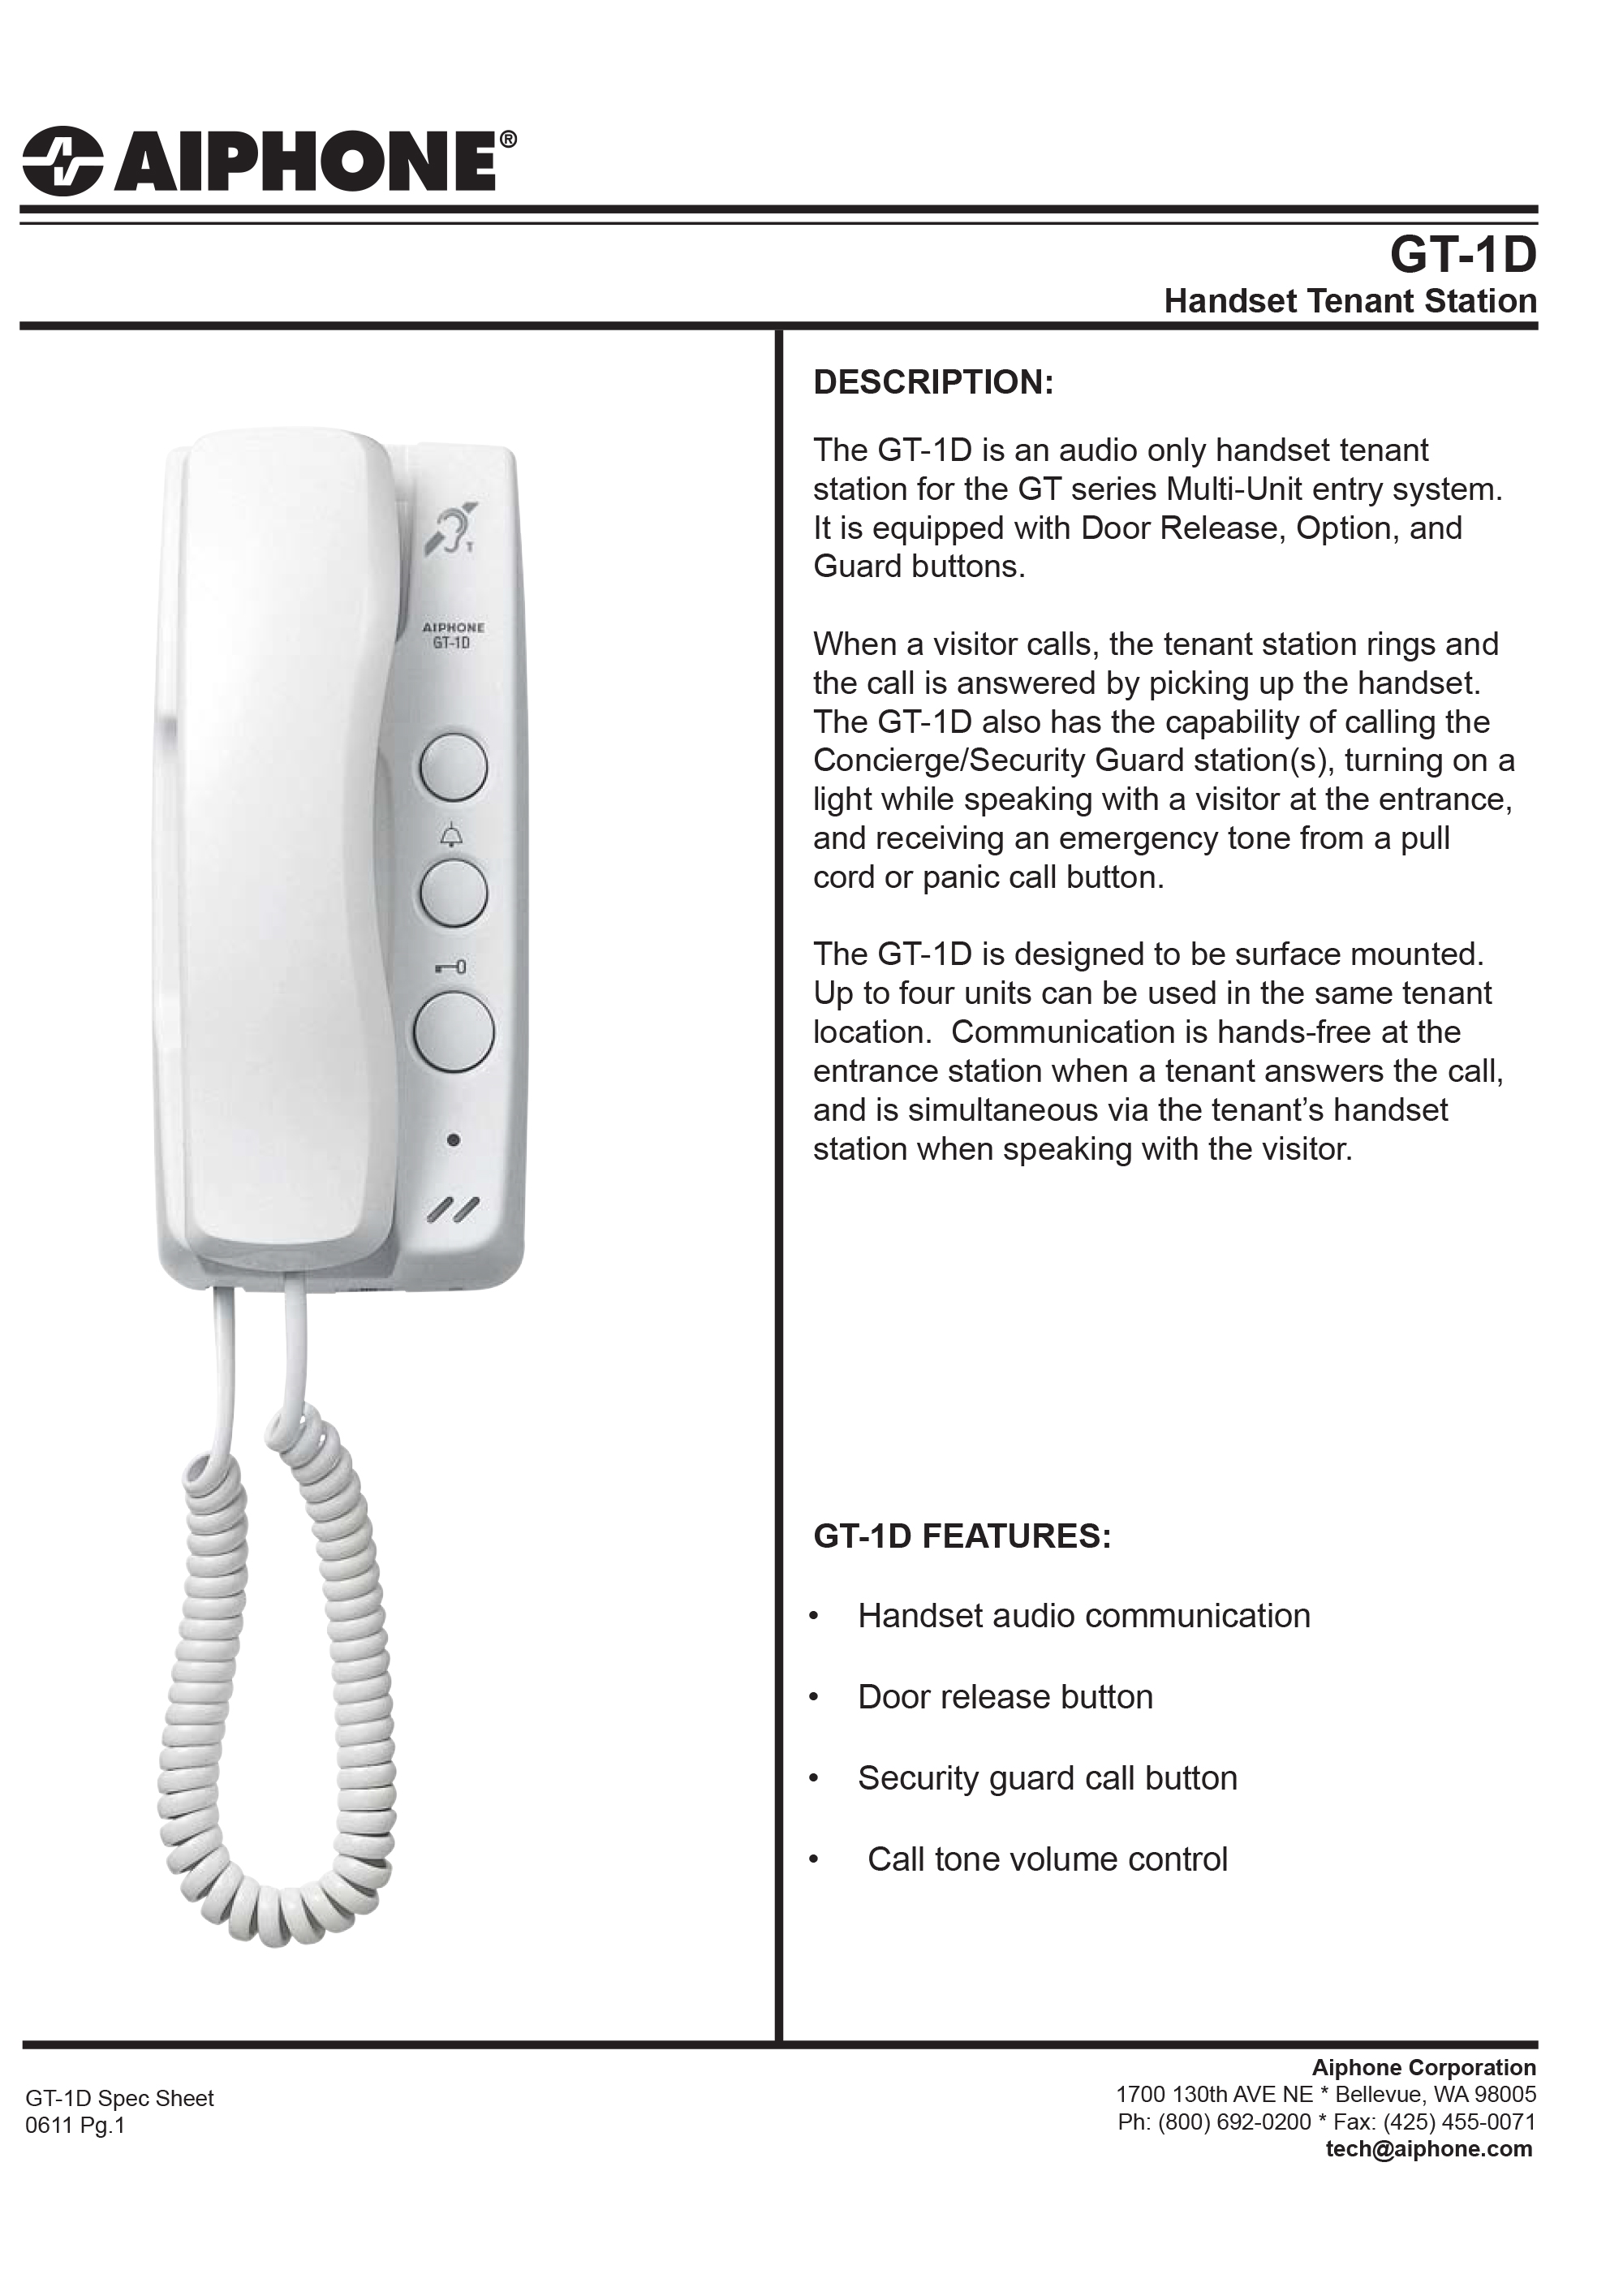 Sierra Innovations 187 Aiphone Gt 1d Hanset Tenant Station